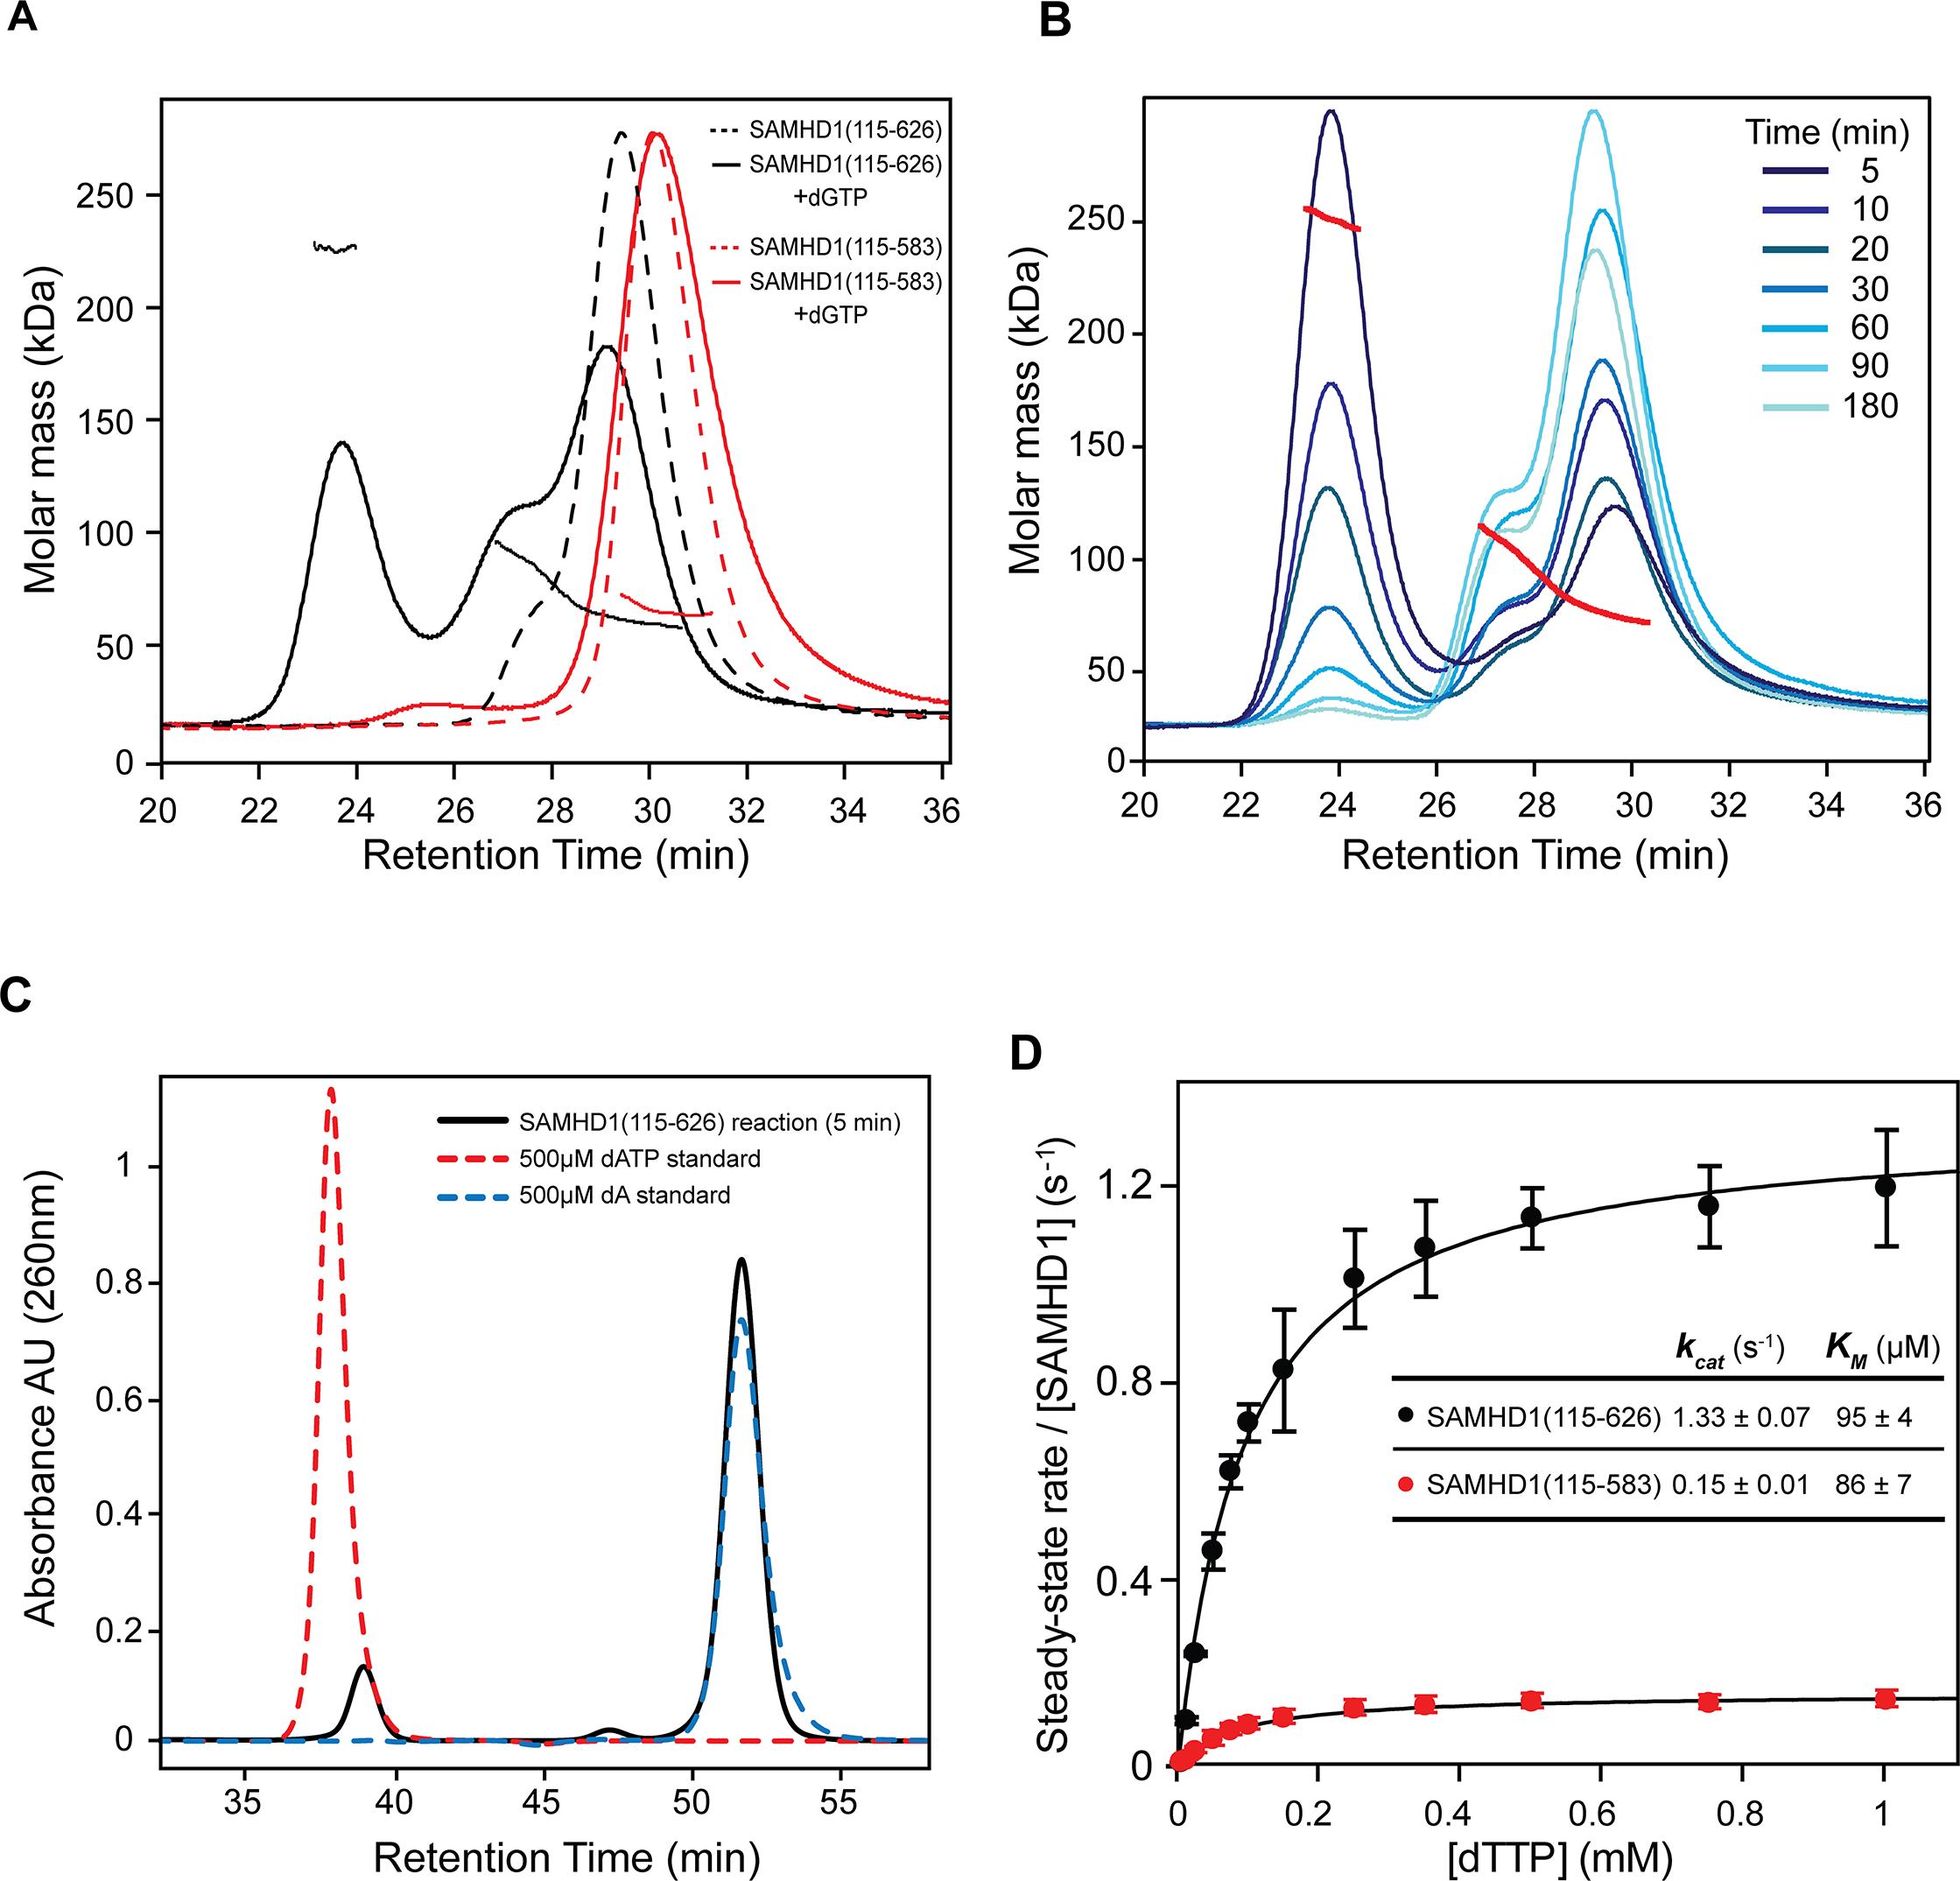 Solution oligomeric state and steady state kinetics of SAMHD1.